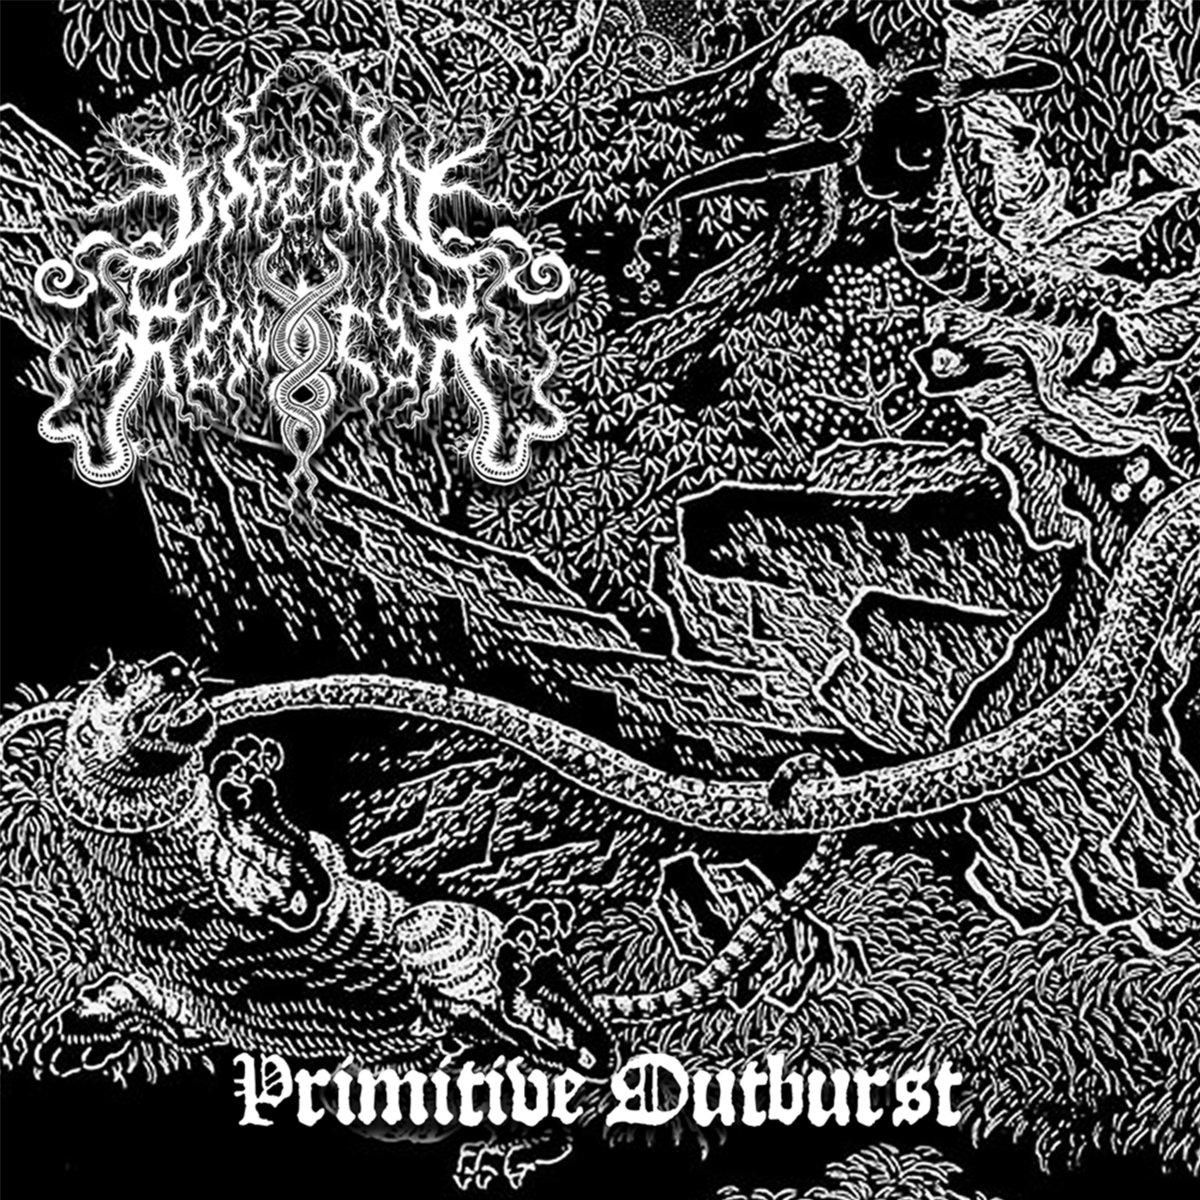 inferno requiem – primitive outburst